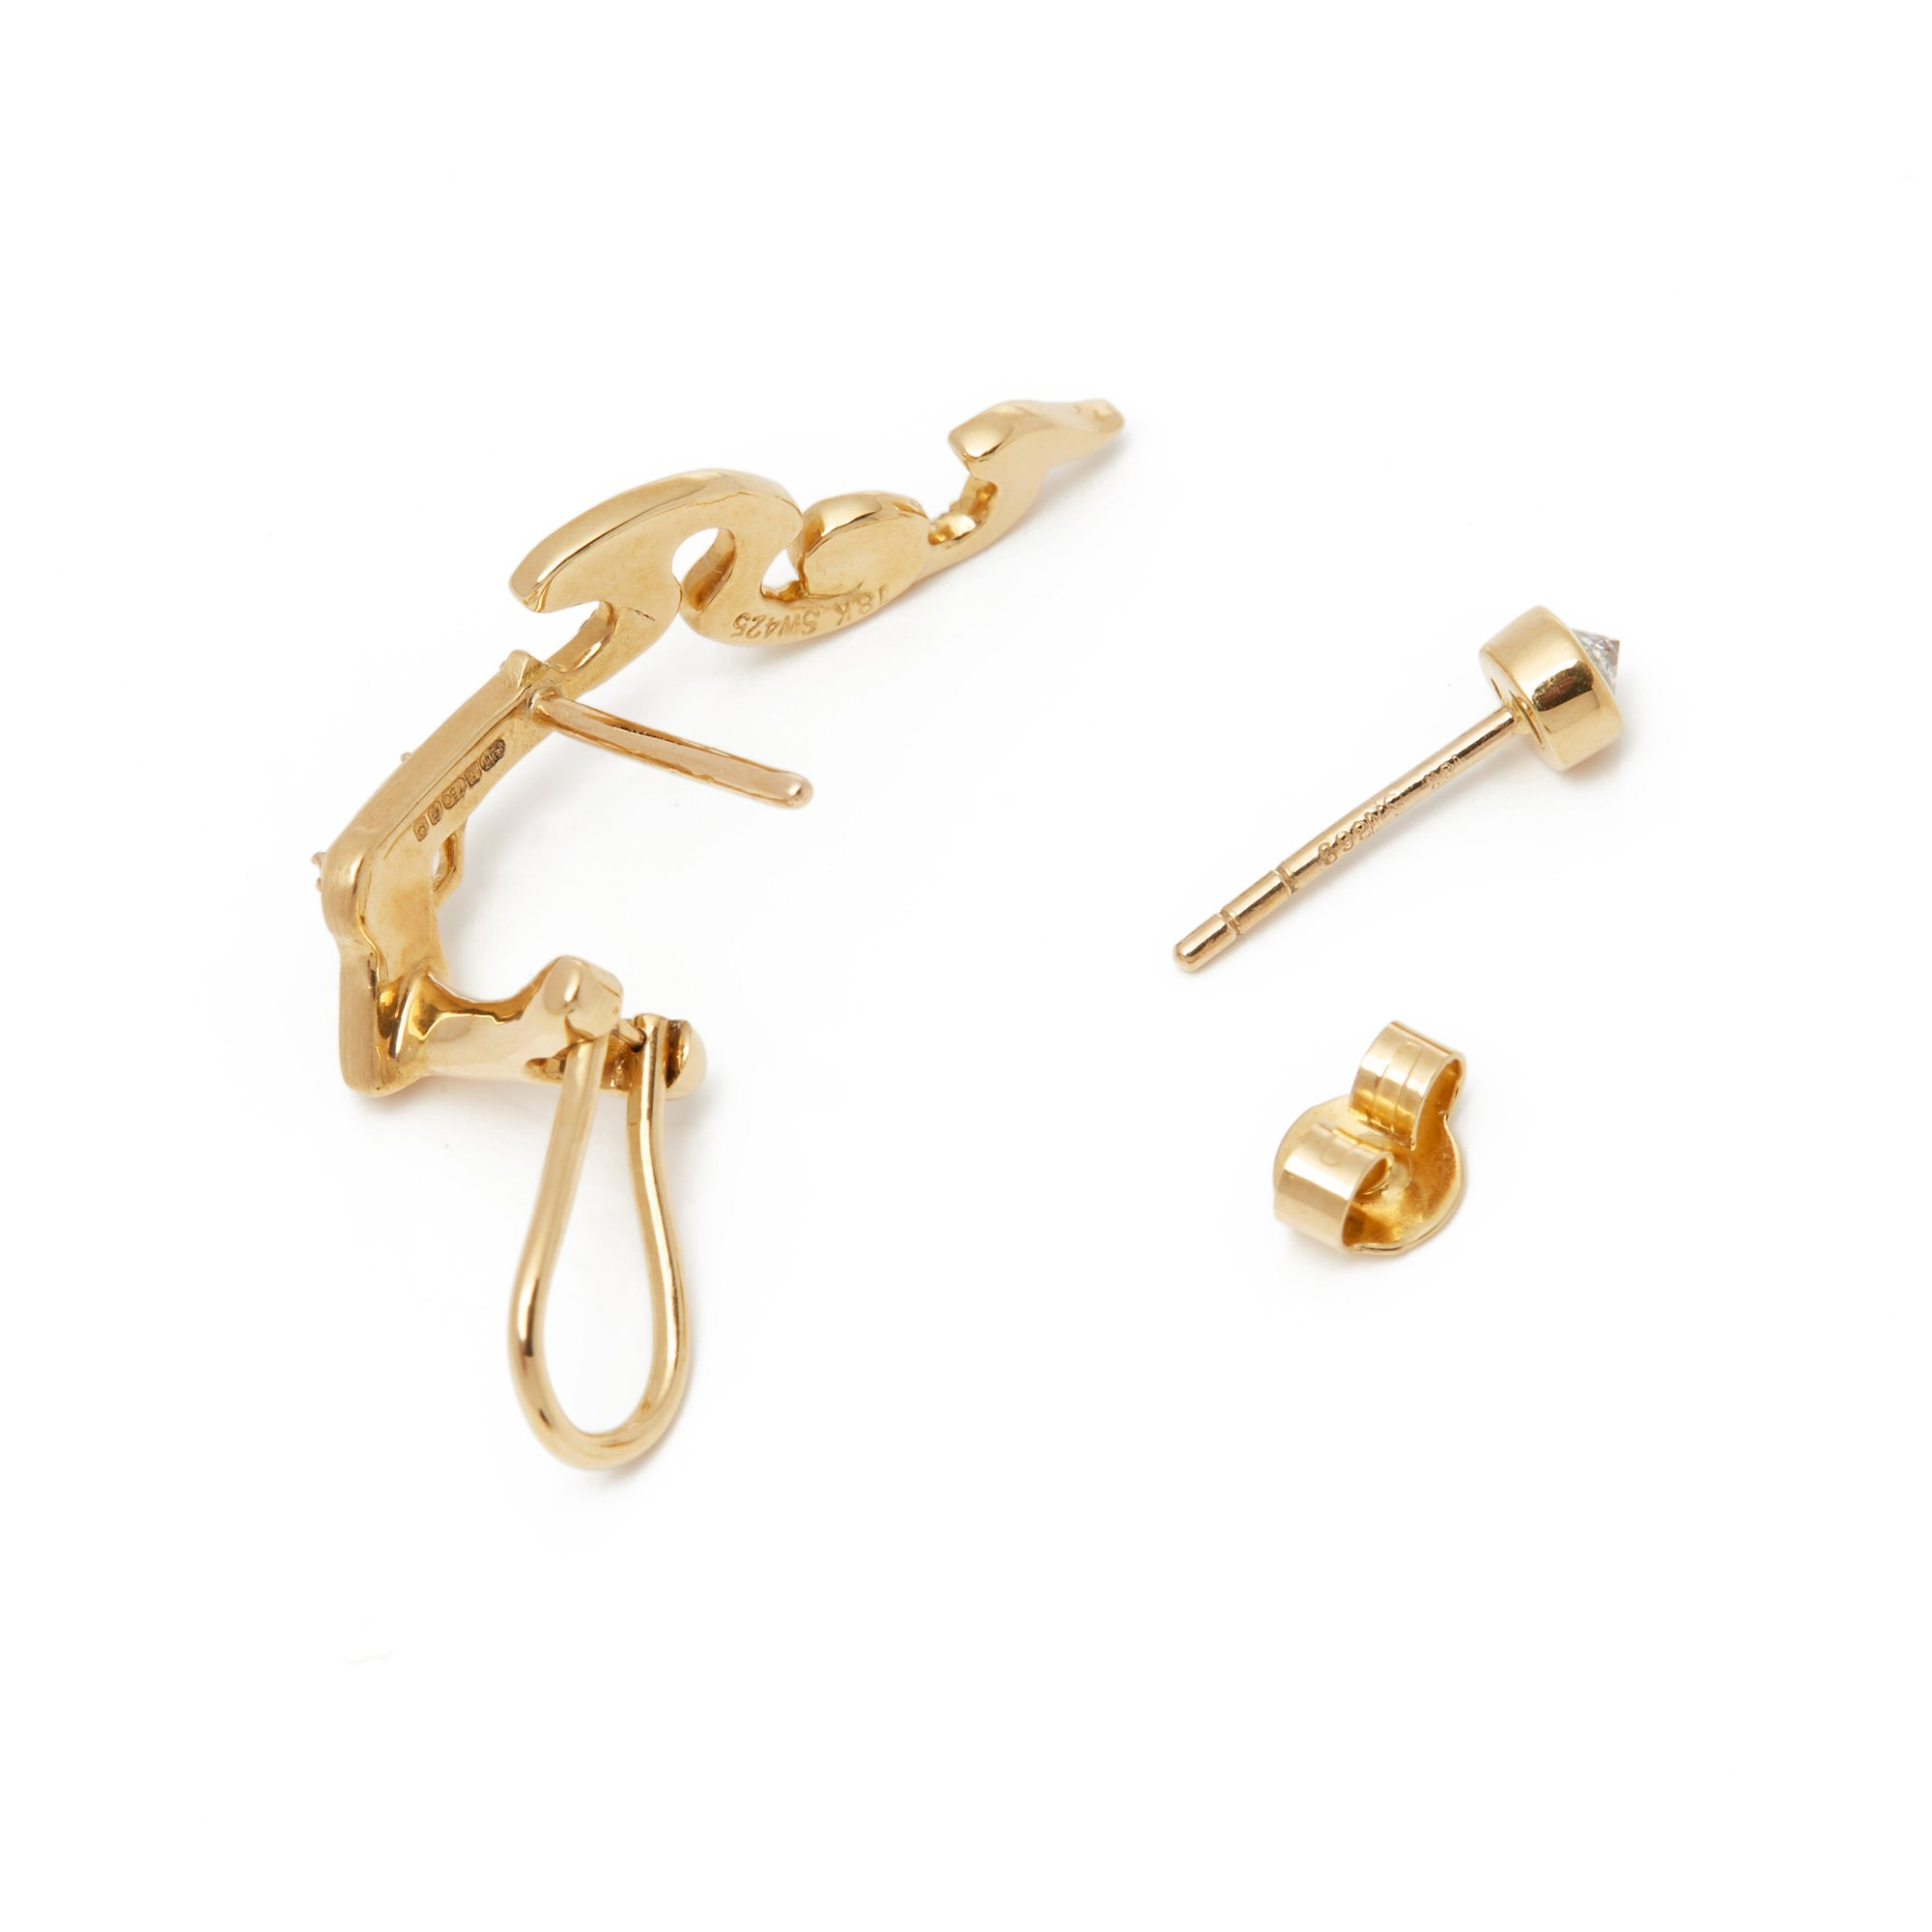 Stephen Webster 18k Yellow Gold Murder She Wrote Earrings